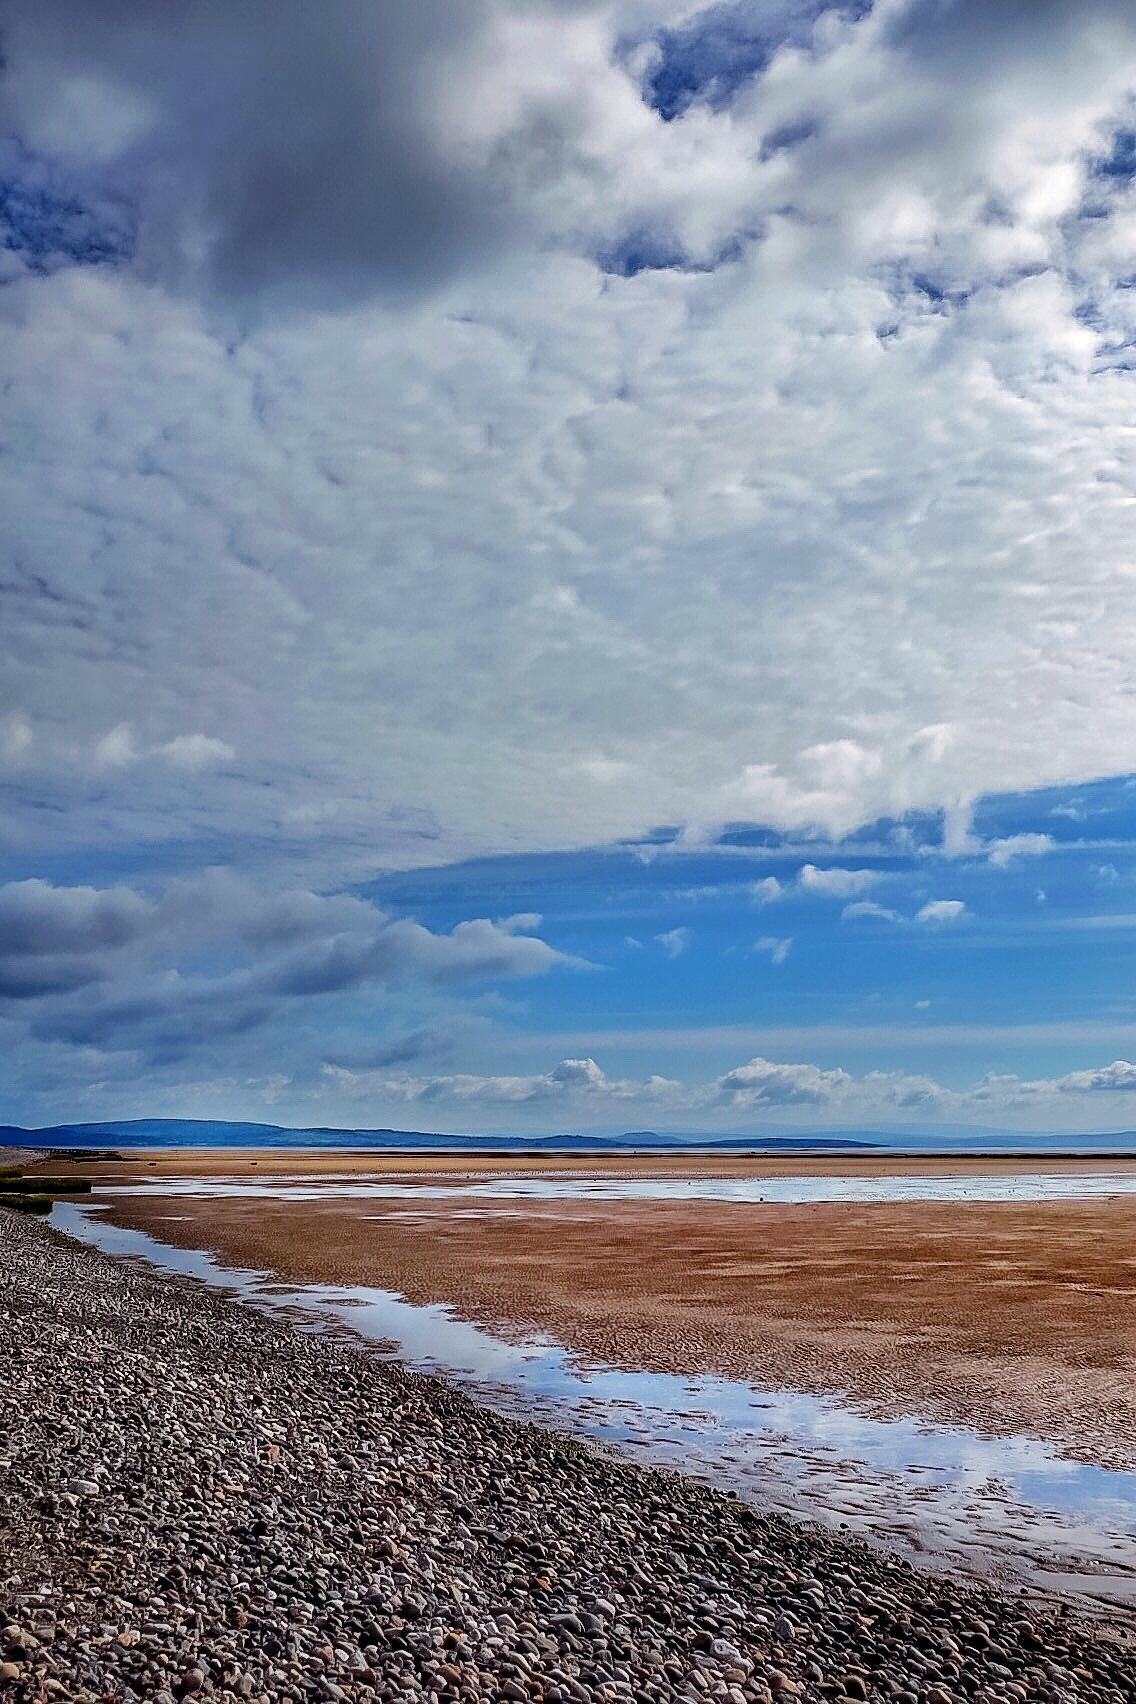 Morecambe Bay Cumbria...09080614 by Michael jjg